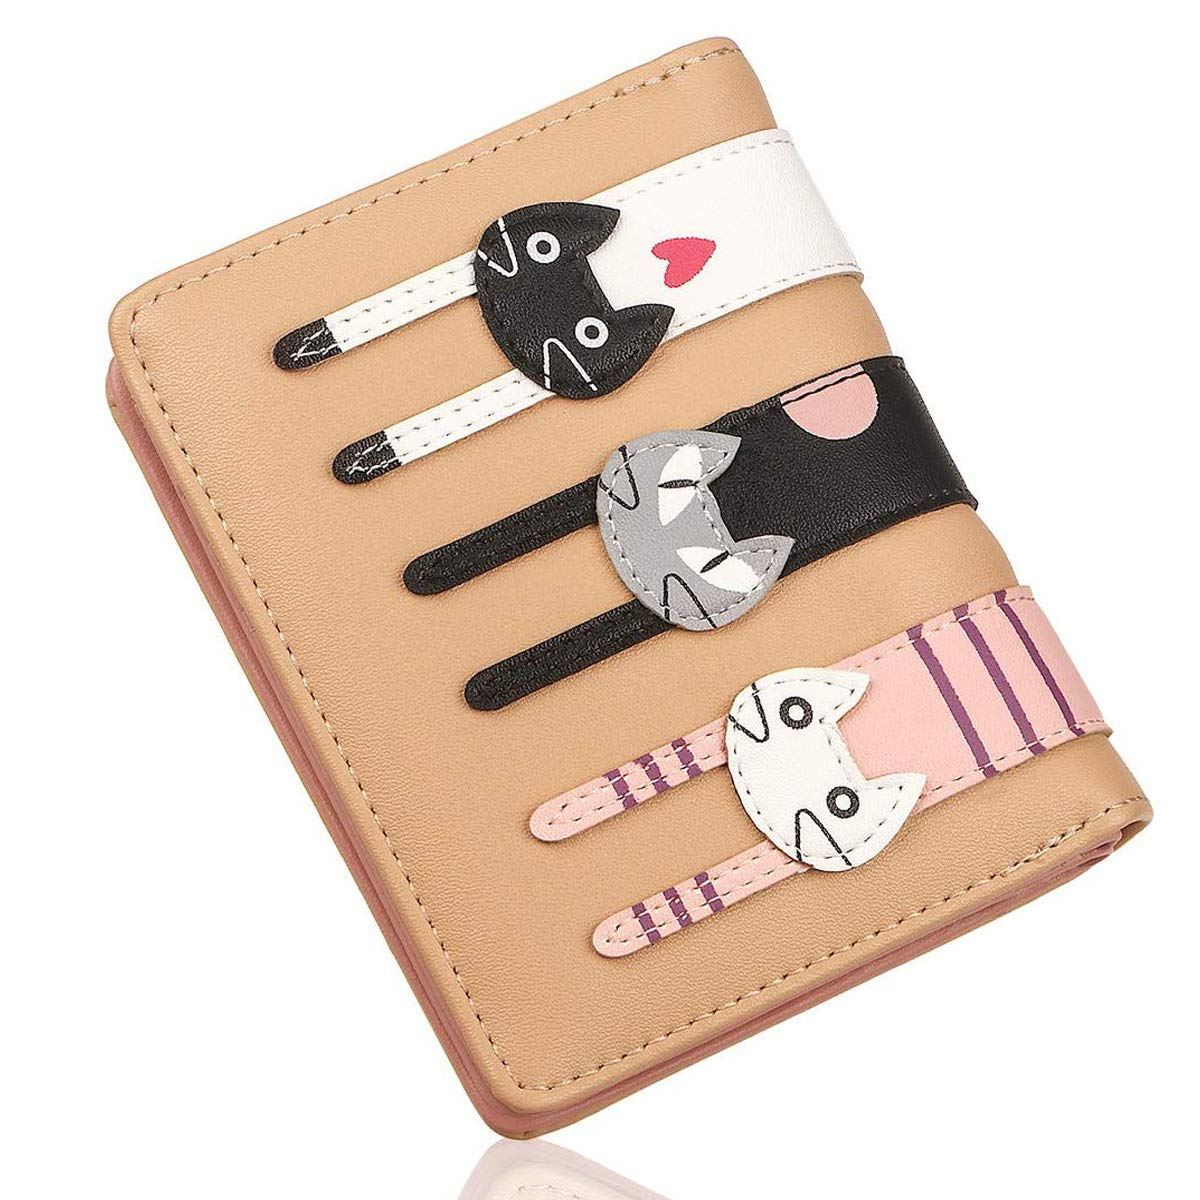 Posher AQ Women Coin Purse Cute Cat Wallet Card Holder Double-layer Wallet Clutch Bag